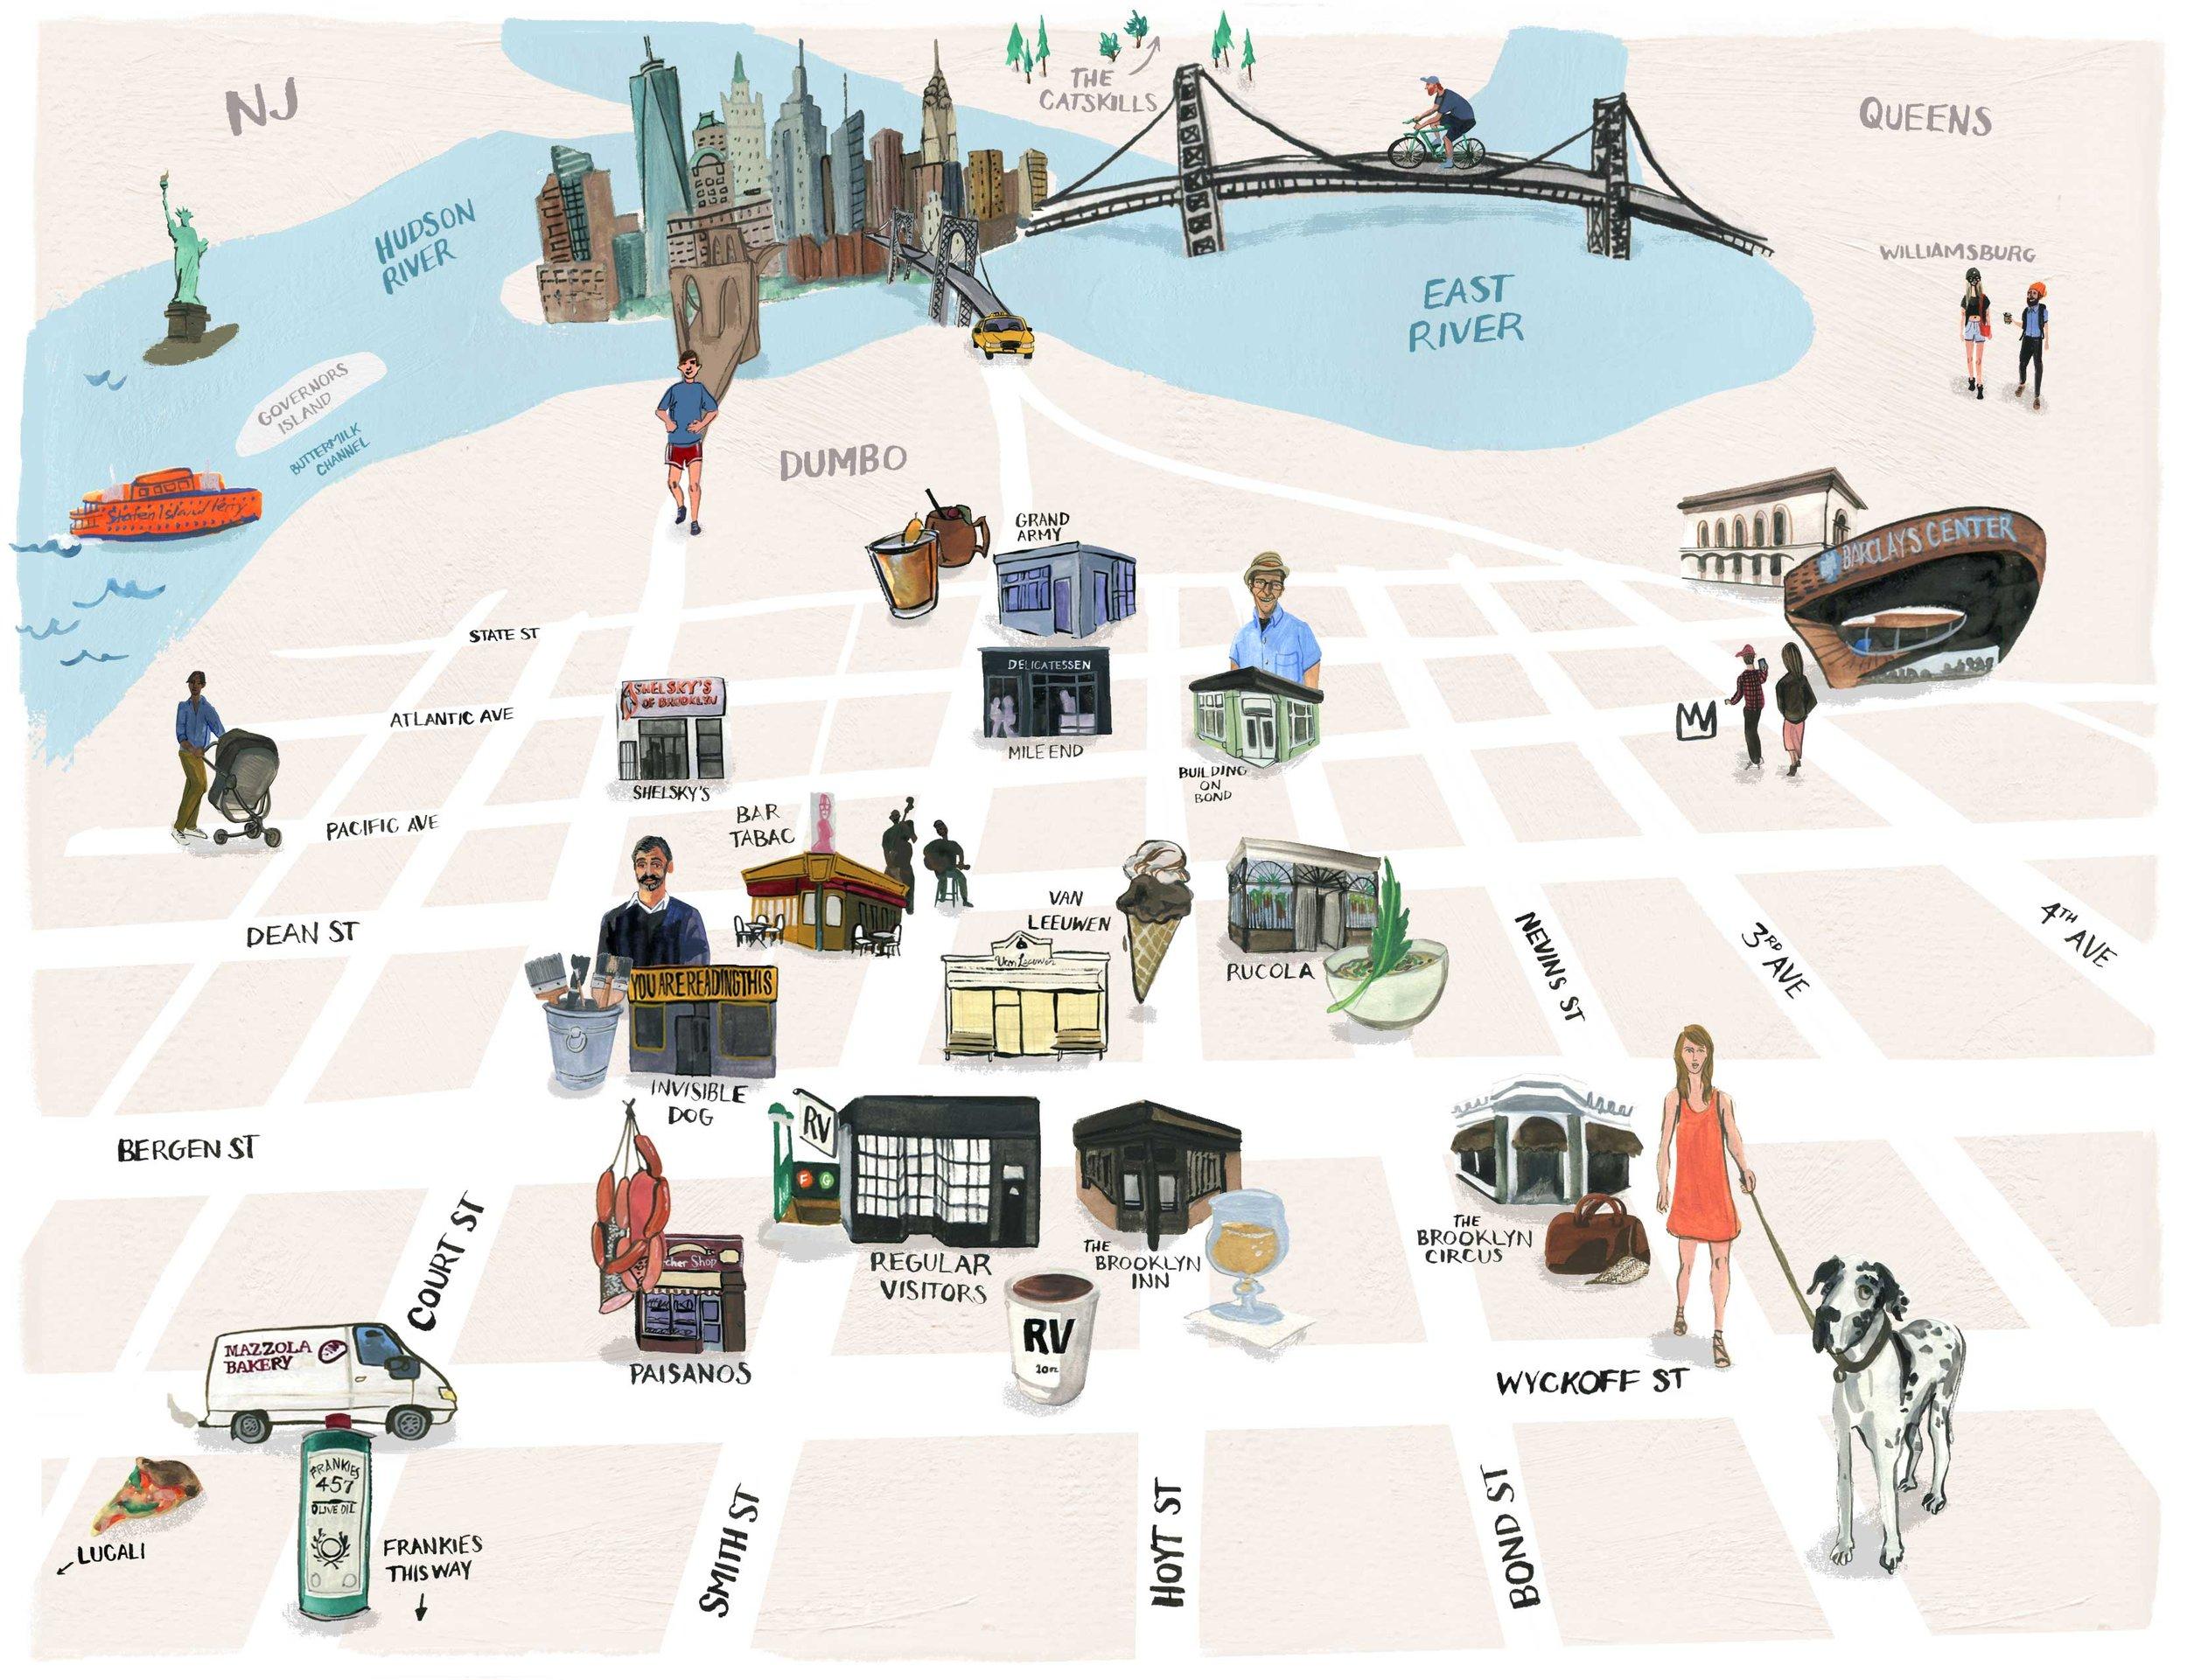 Boerum Hill Map for Regular Visitors